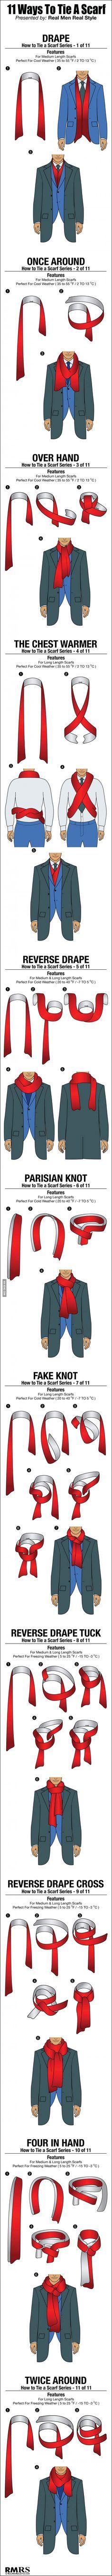 11 Maneras de ponerse un pañuelo o bufanda